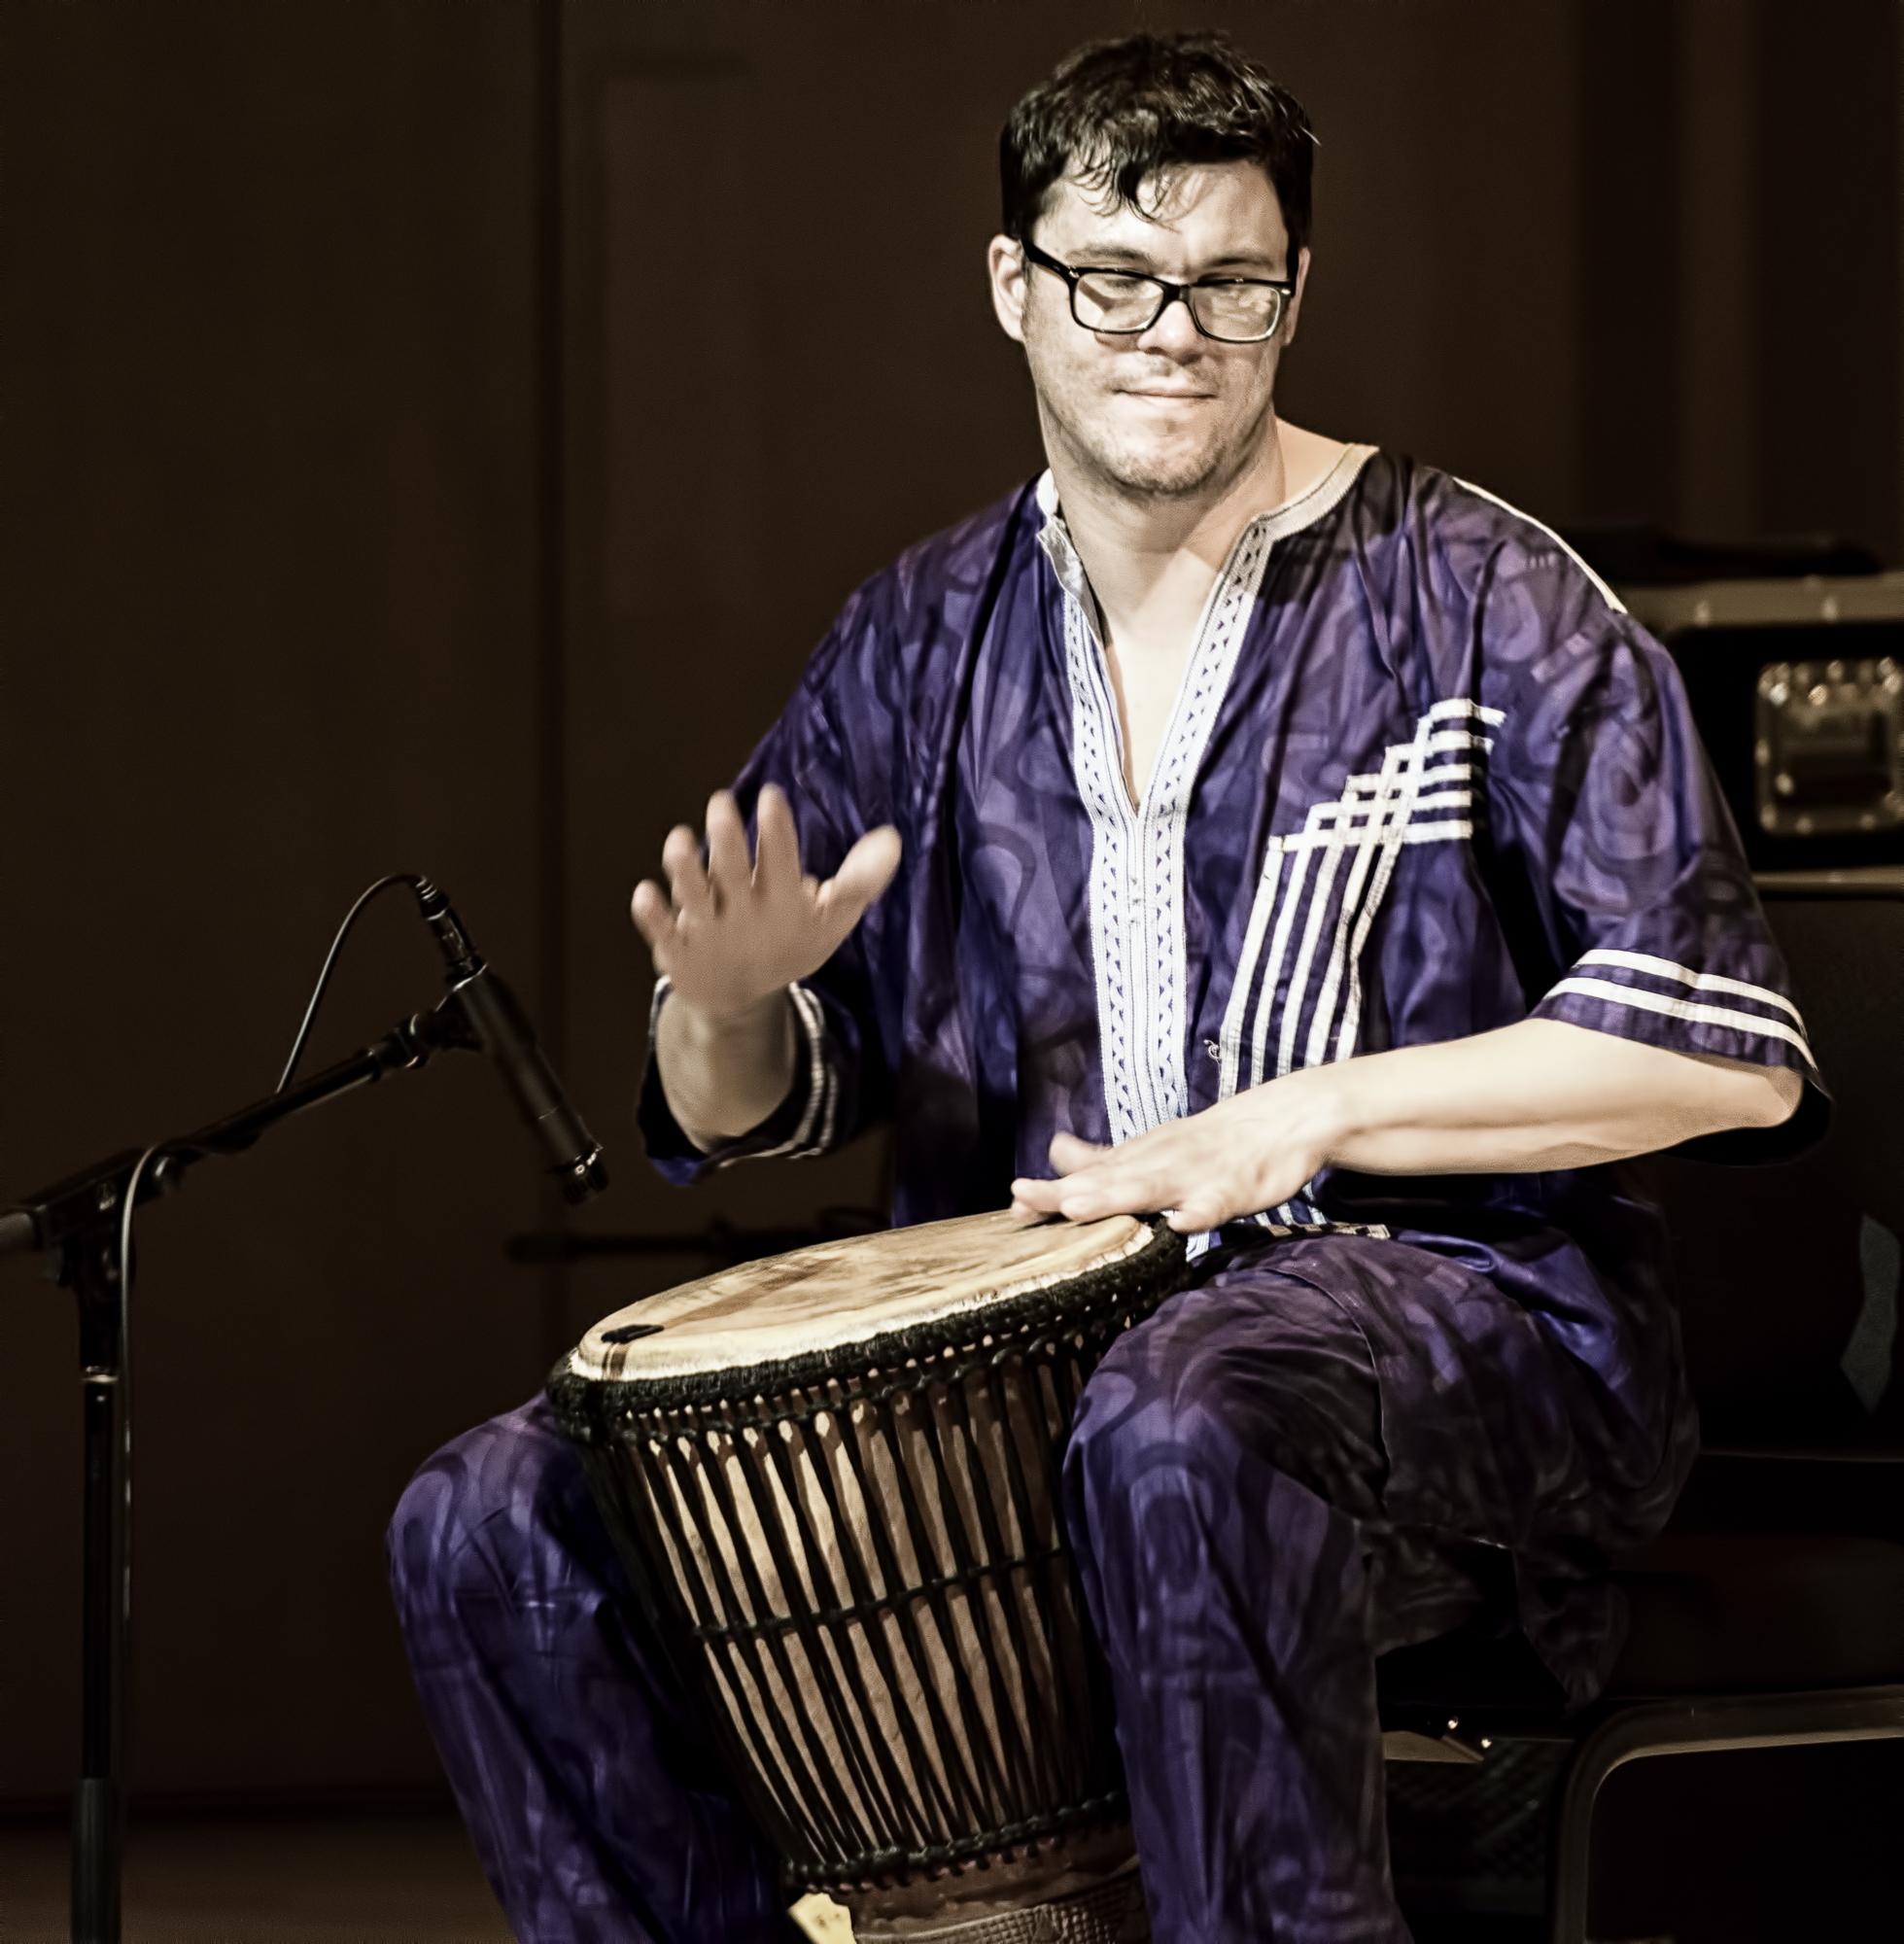 Corey Wilhelm with Bombino At The Musical Instrument Museum (MIM) In Phoenix